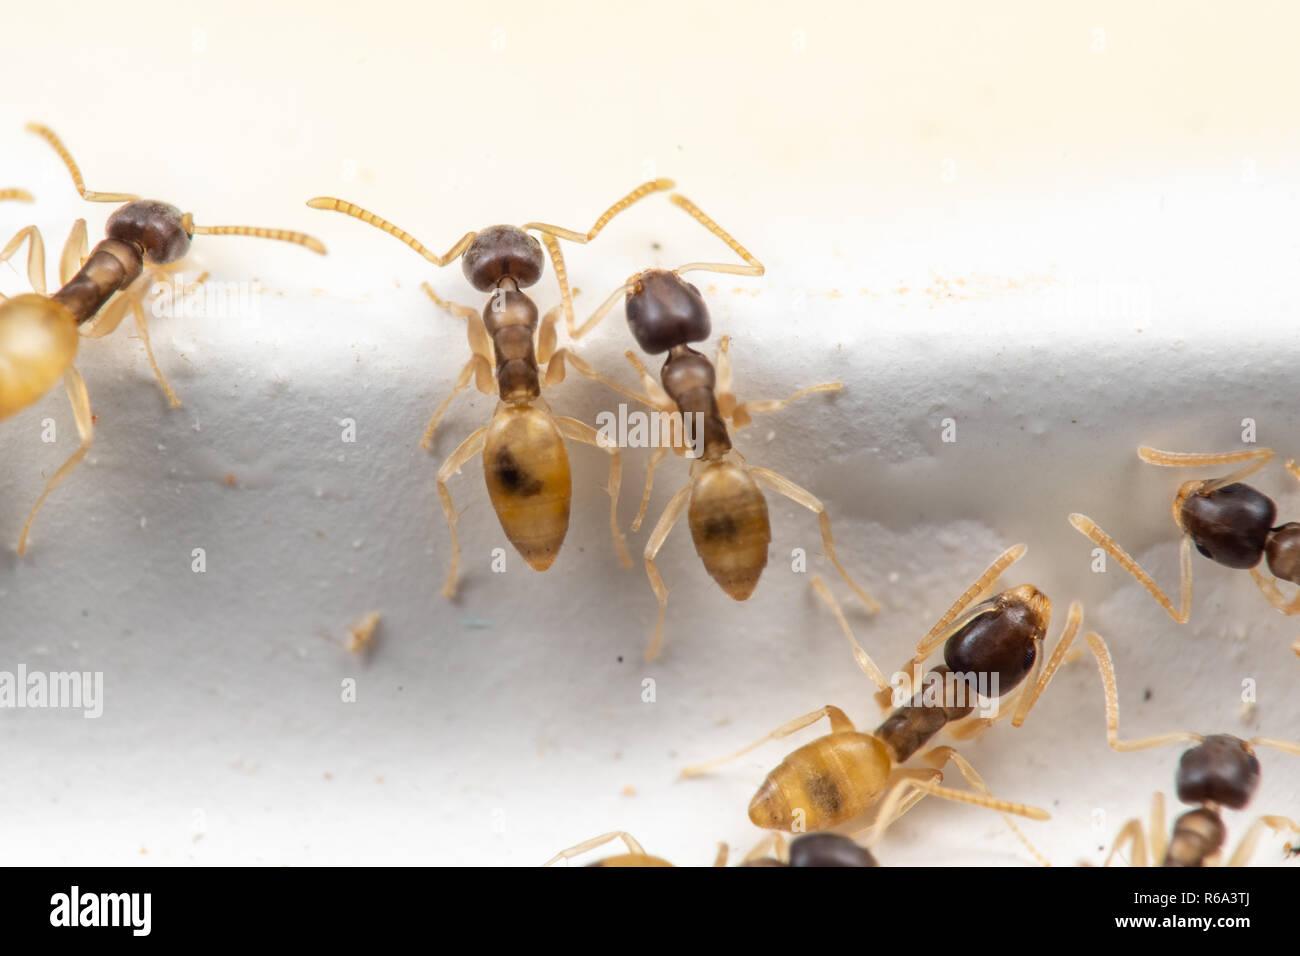 Tapinoma melanocephalum ghost ants from above - Stock Image